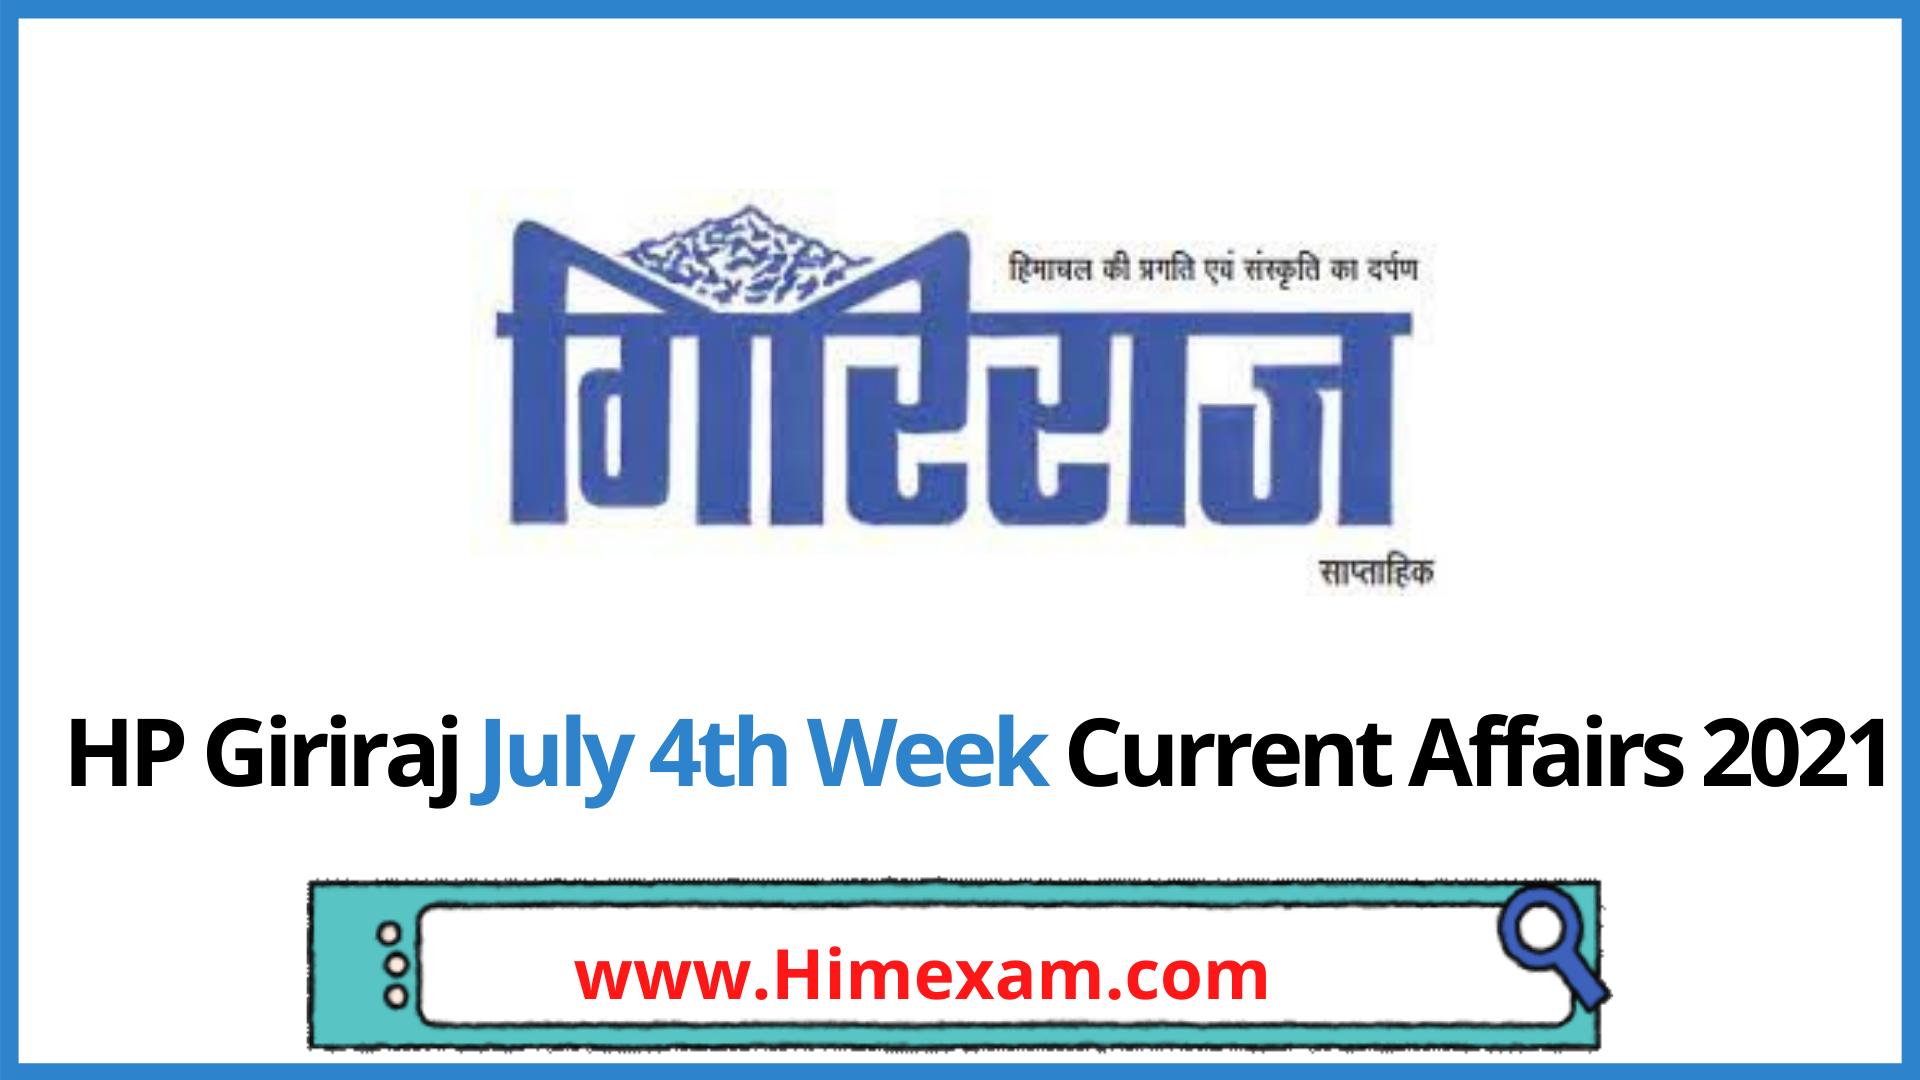 HP Giriraj July 4th Week Current Affairs 2021 In English